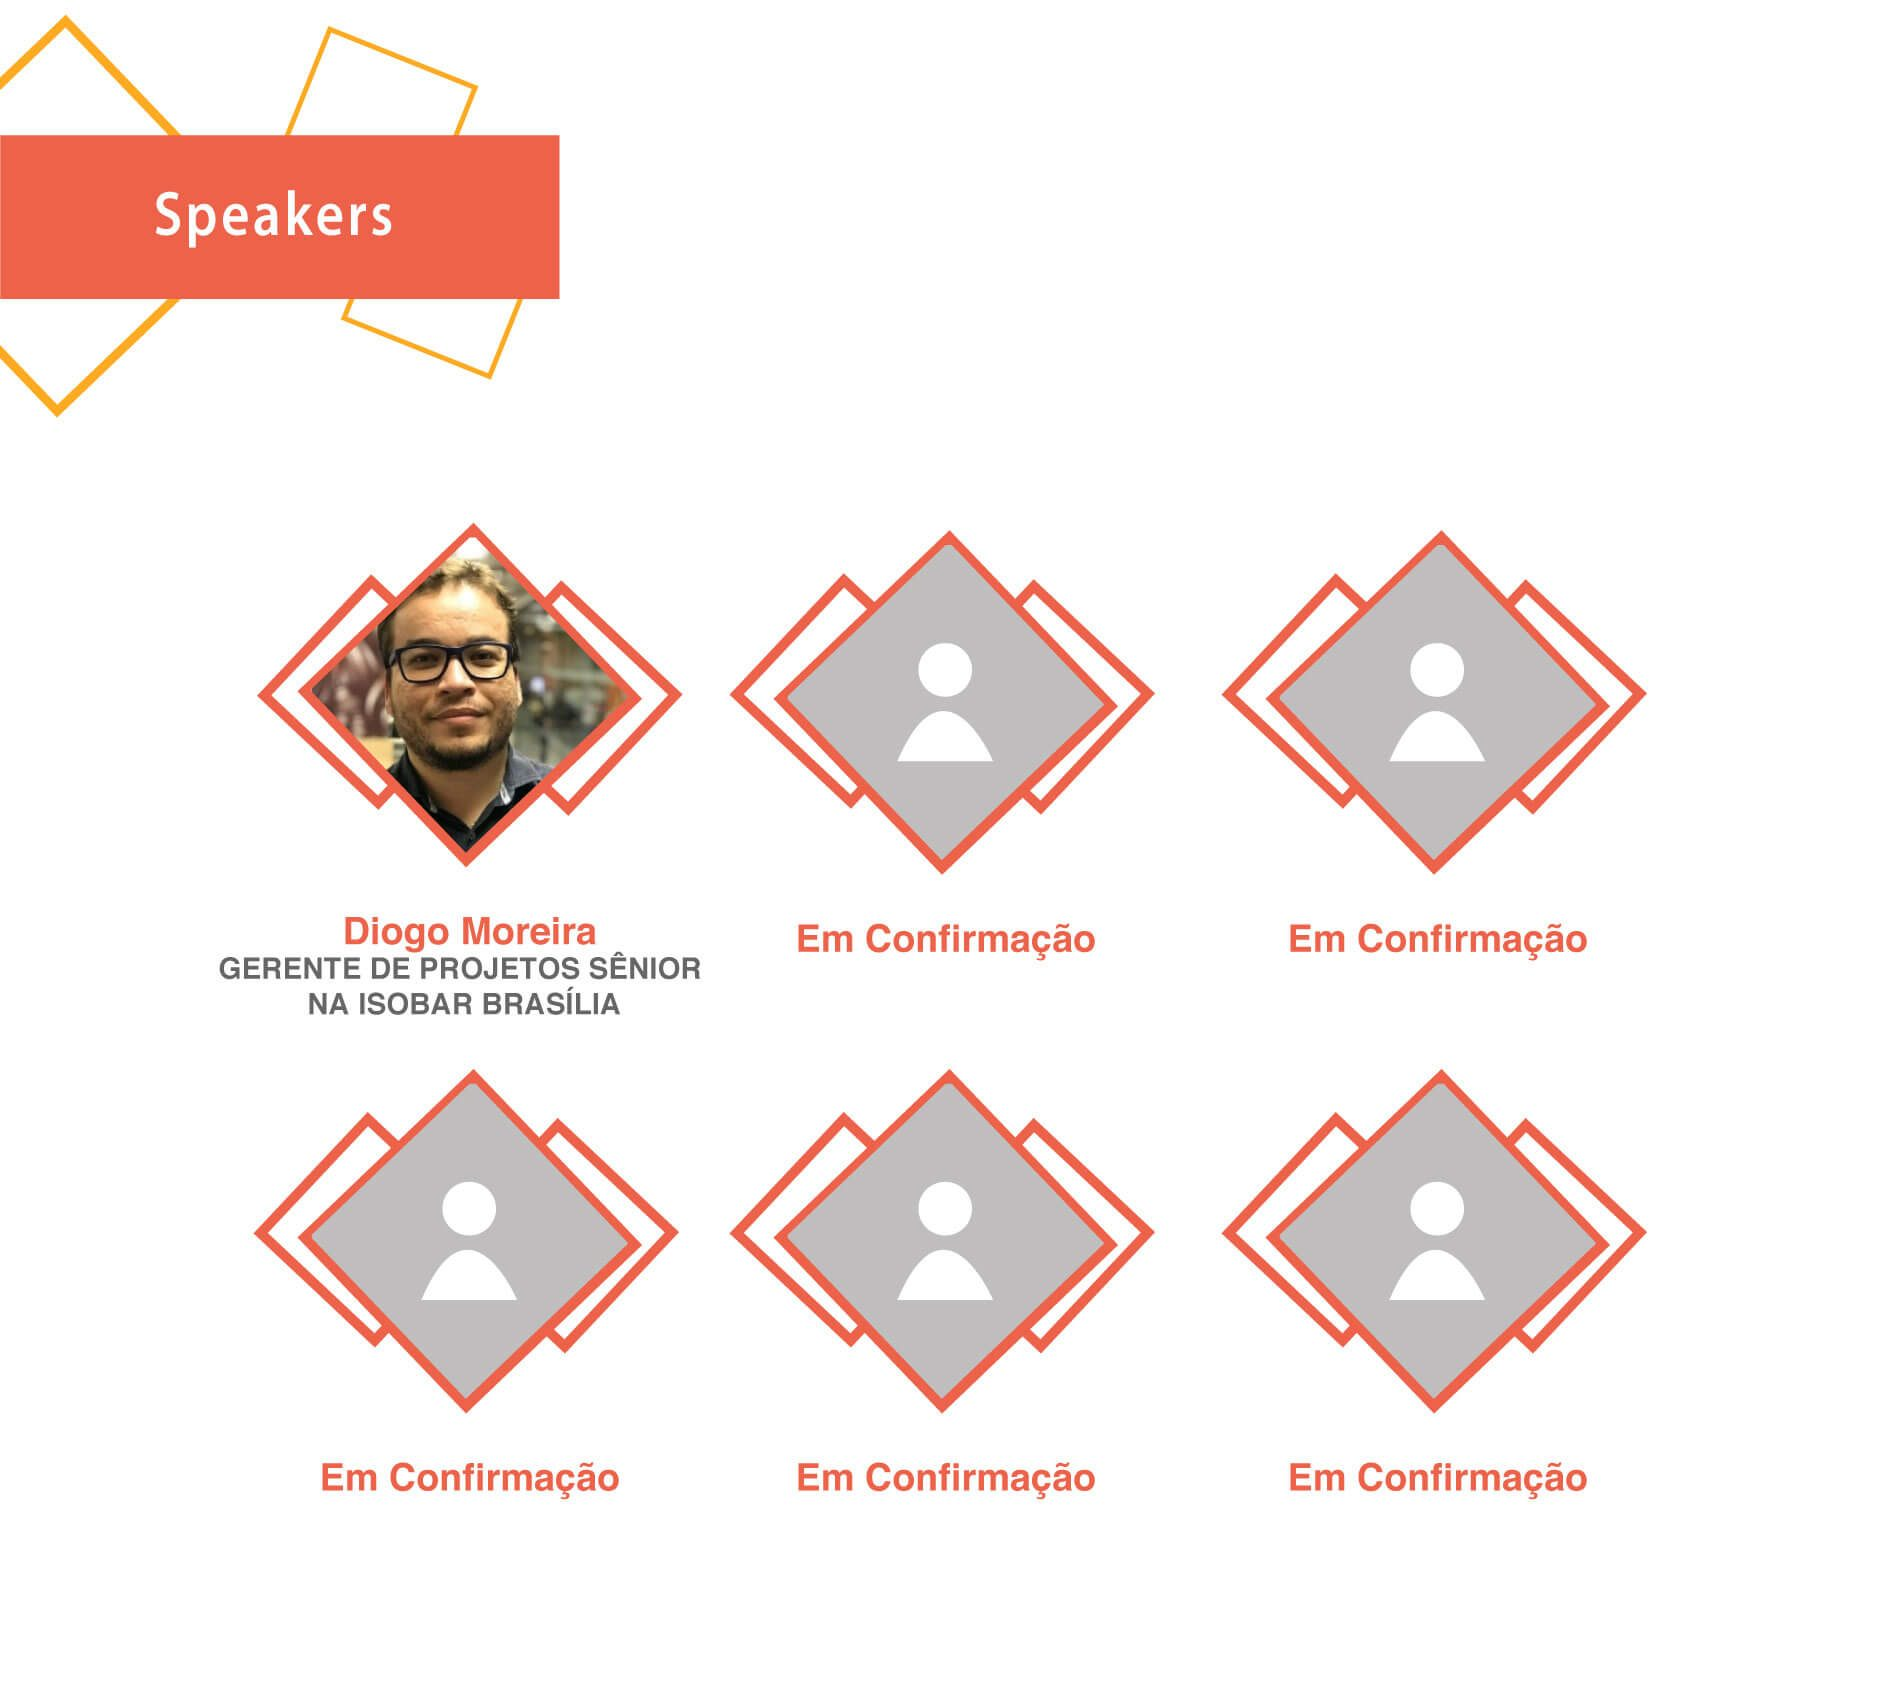 https://www.mestregp.com.br/wp-content/uploads/2018/02/Pagina-FórumBRA-speakers-1900x1695.jpg